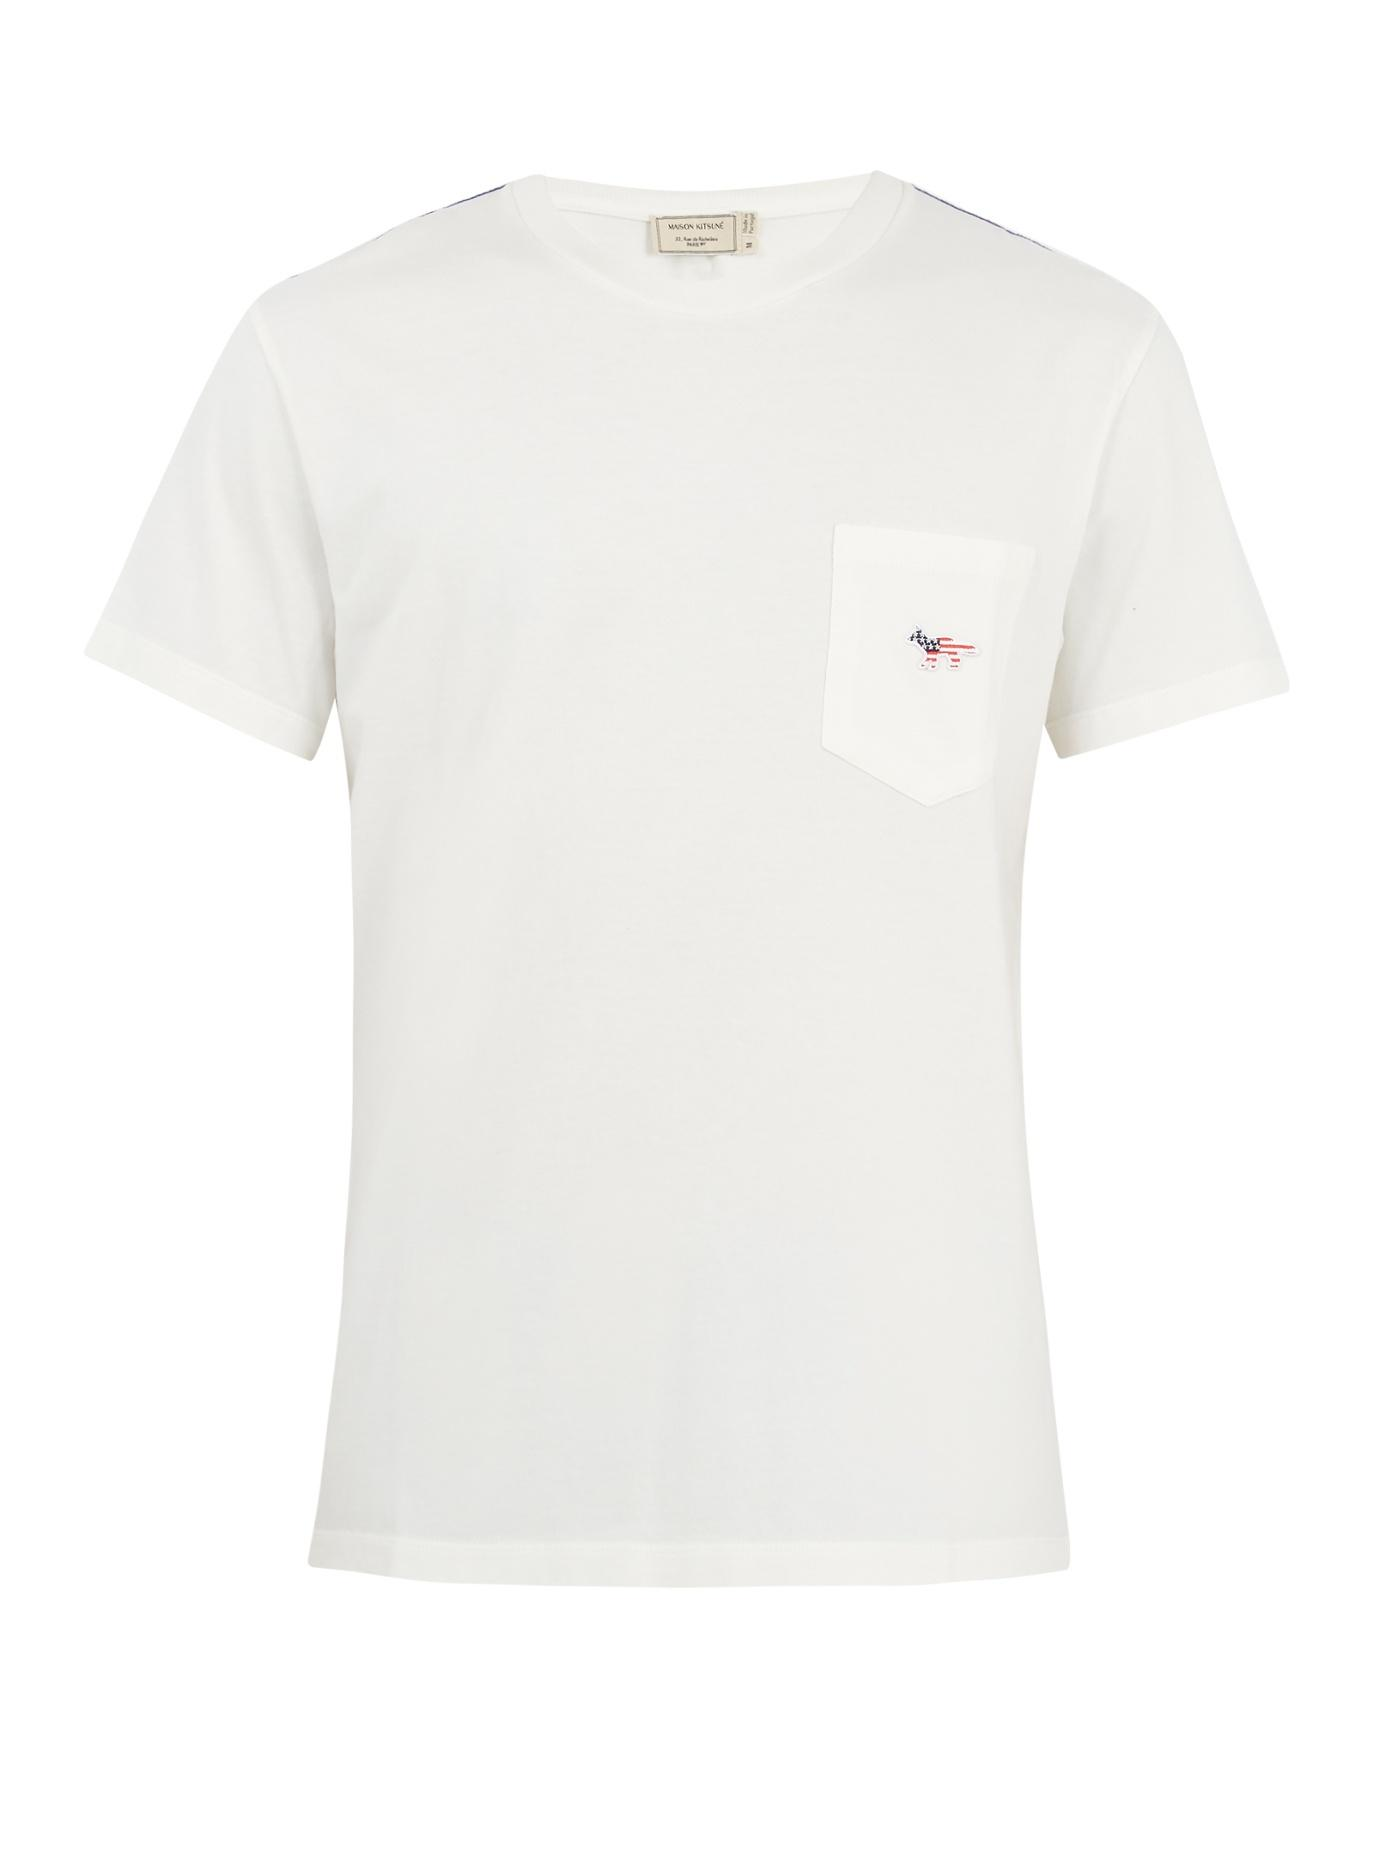 Maison KitsunÉ Patch-Pocket Cotton T-Shirt In White